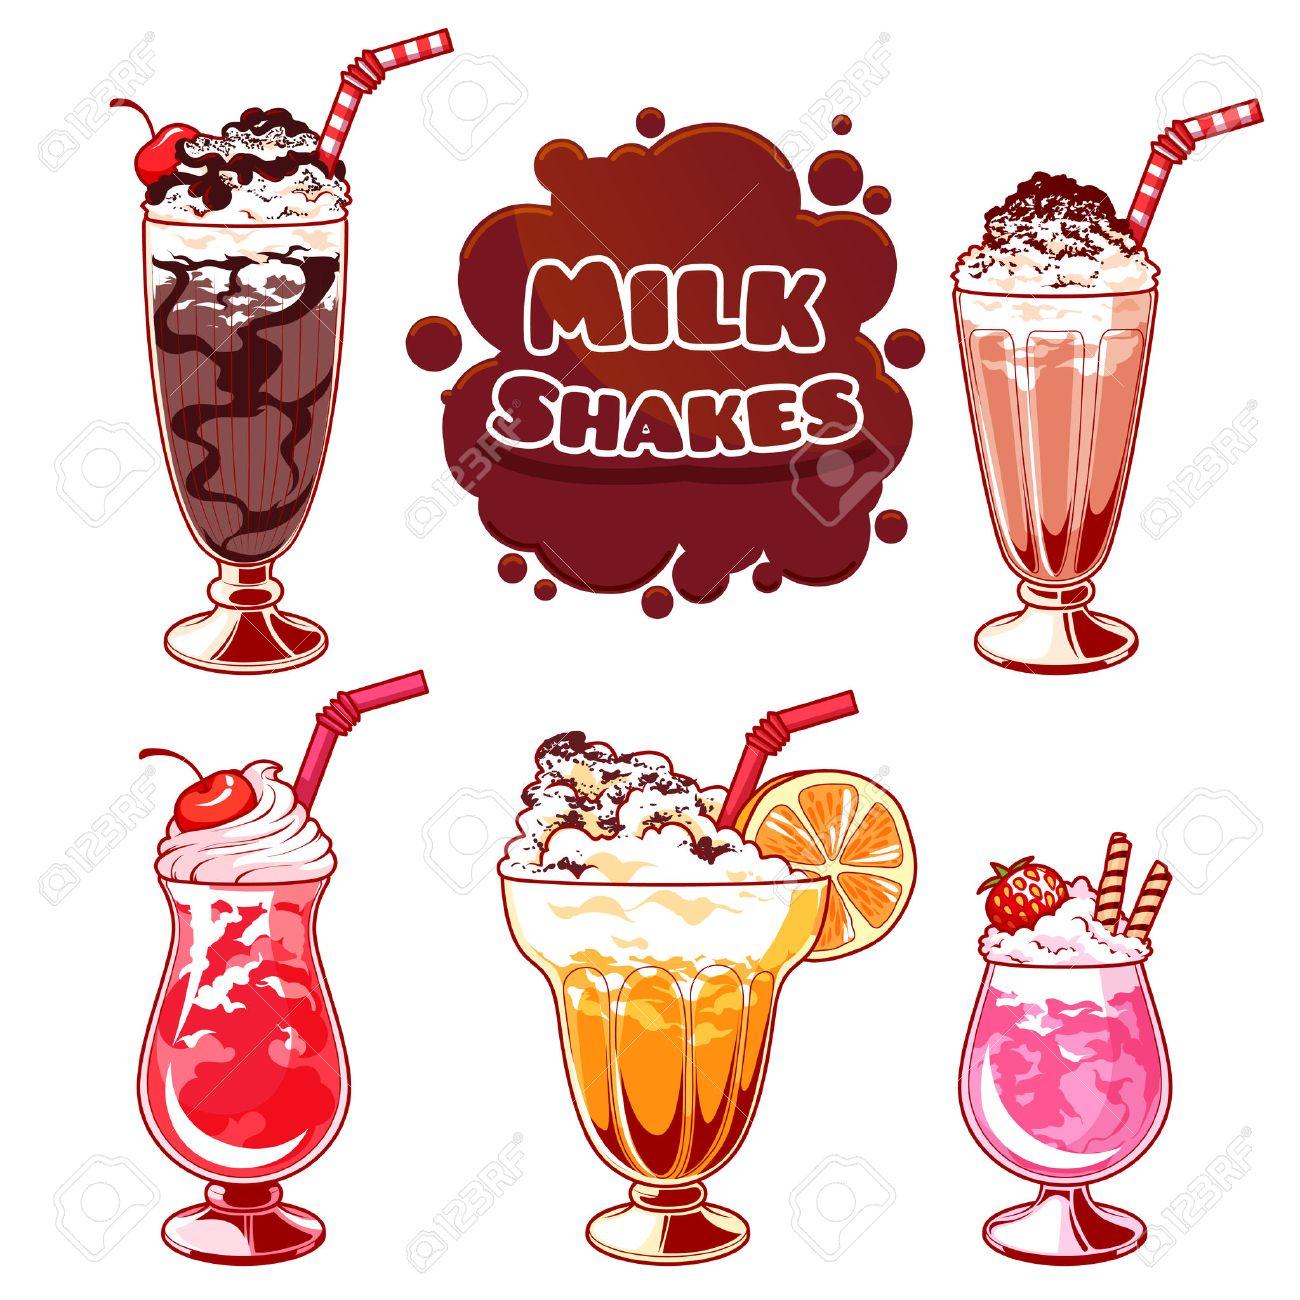 Set of different milkshakes. Chocolate milkshake, cherry milkshake, strawberry milkshake, vanilla milkshake and orange milkshake. Vector cartoon illustration isolated on a white background. - 52185161